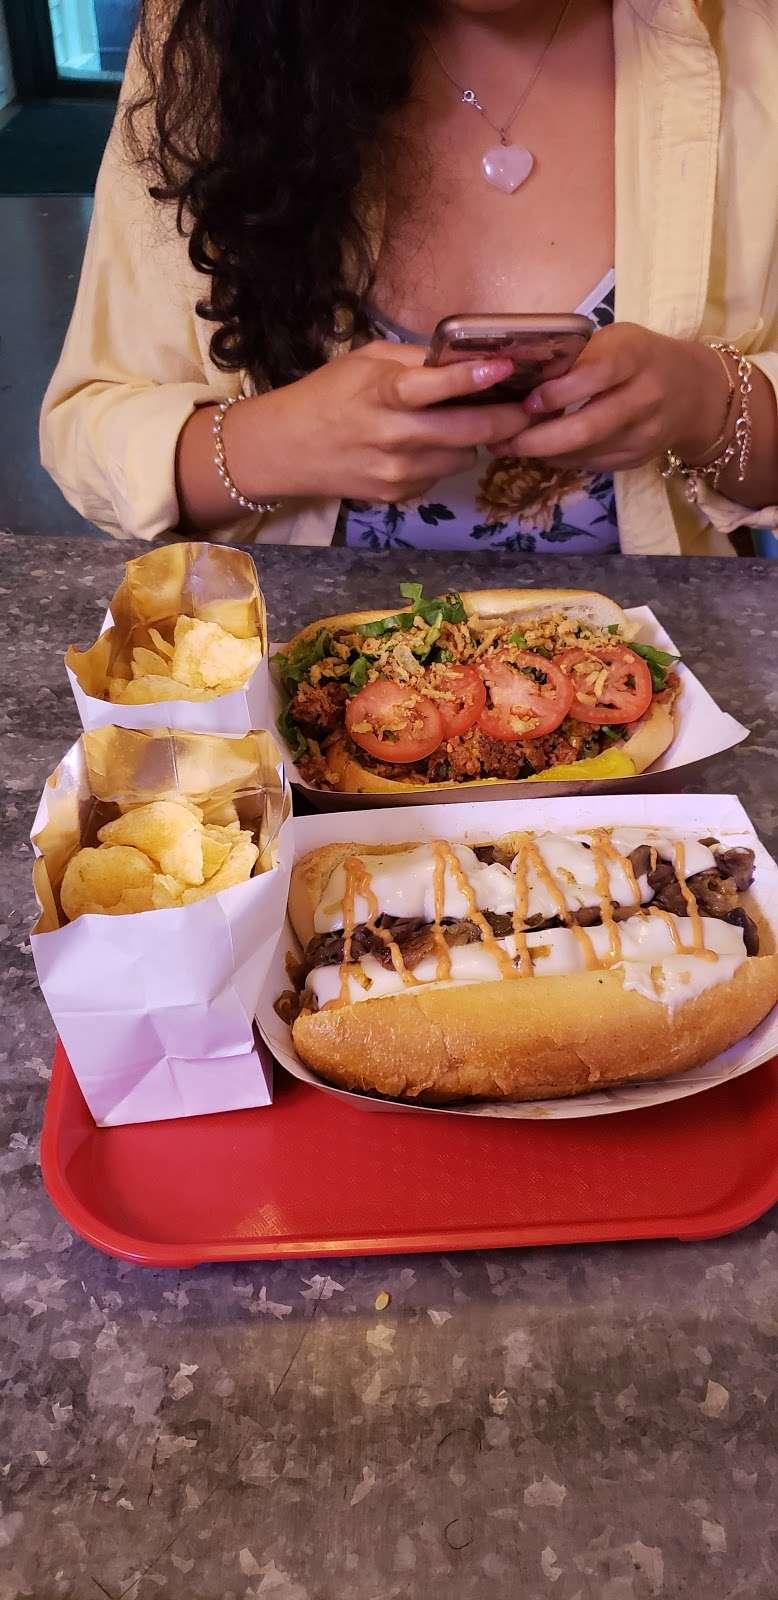 Rips Malt Shop - restaurant  | Photo 2 of 8 | Address: 10 Clermont Ave, Brooklyn, NY 11205, USA | Phone: (347) 689-9009